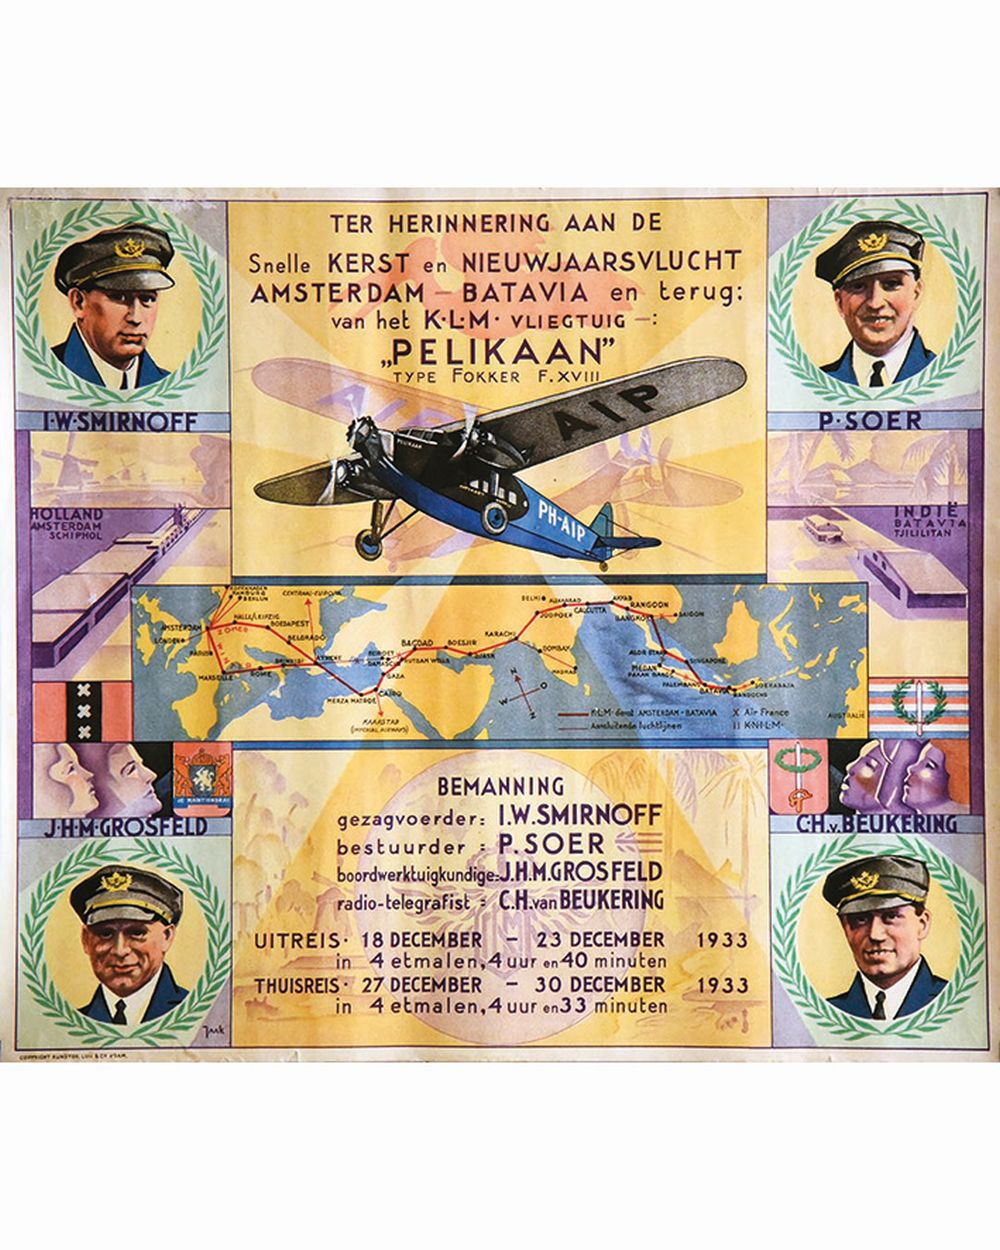 JAAK - Ter herinnering aan de Amsterdam Batavia - Pelikaan type fokker - KLM     1933